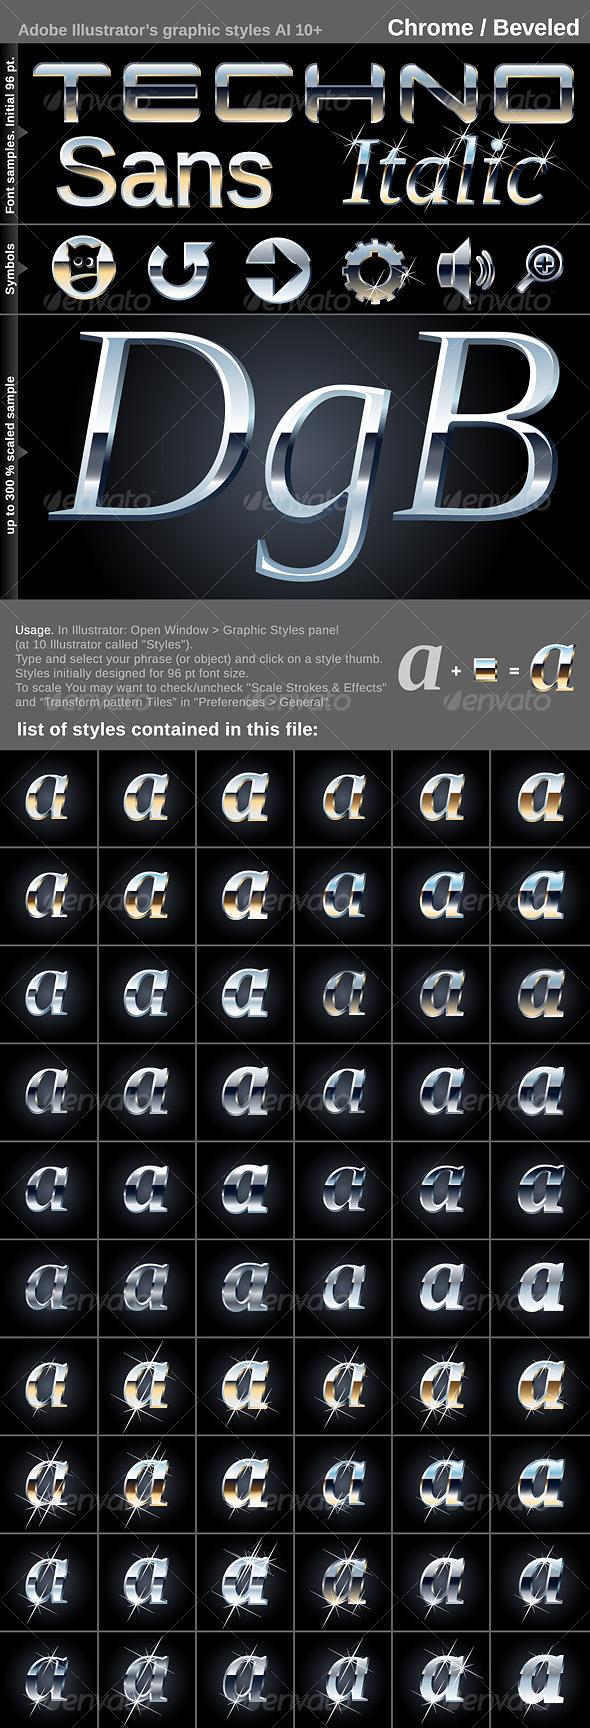 GraphicRiver 60 Illustrator's graphic styles Crome Beveled 100000